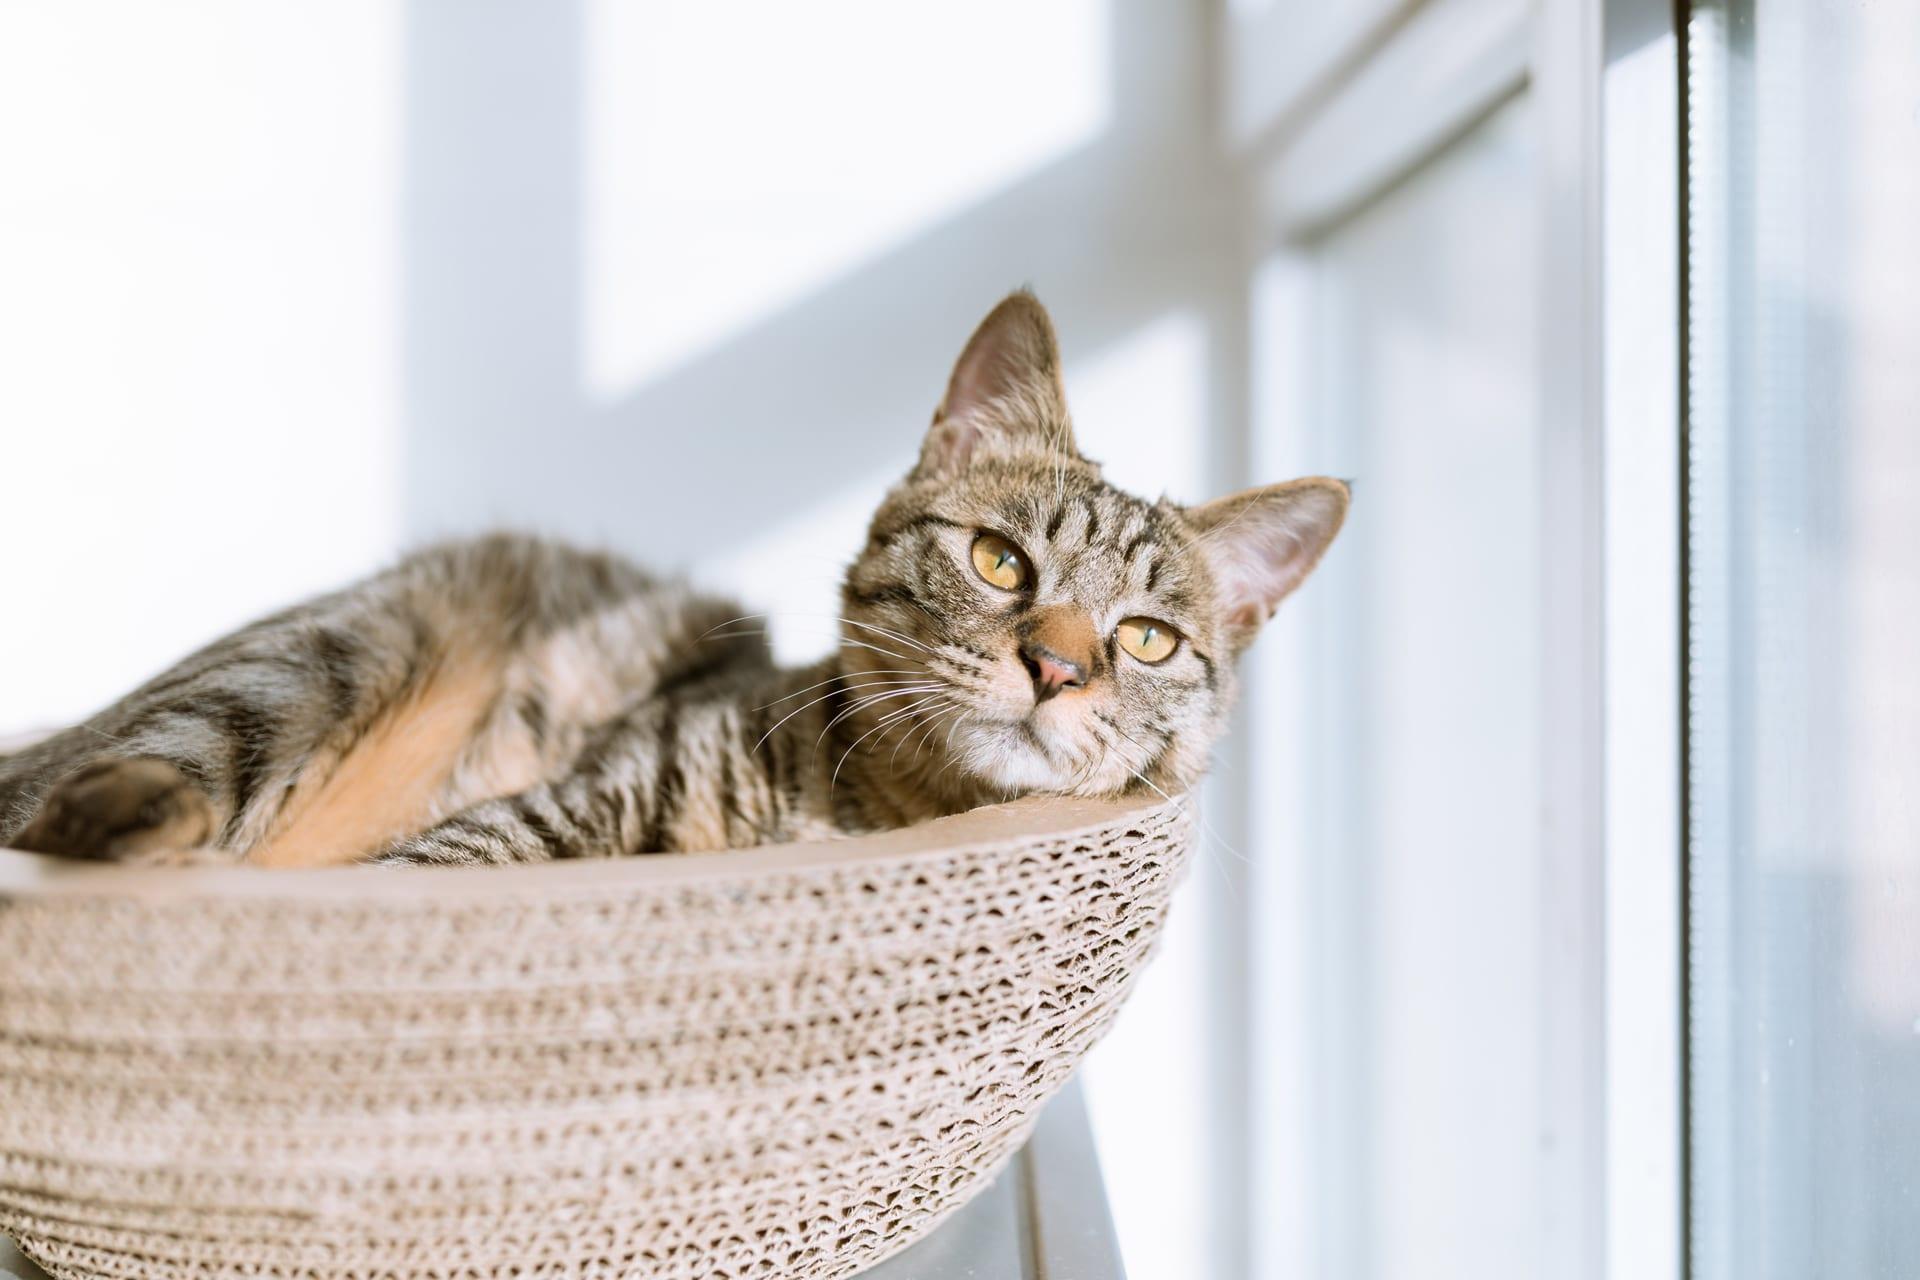 tabby in basket sunlight - Nashville Cat Rescue